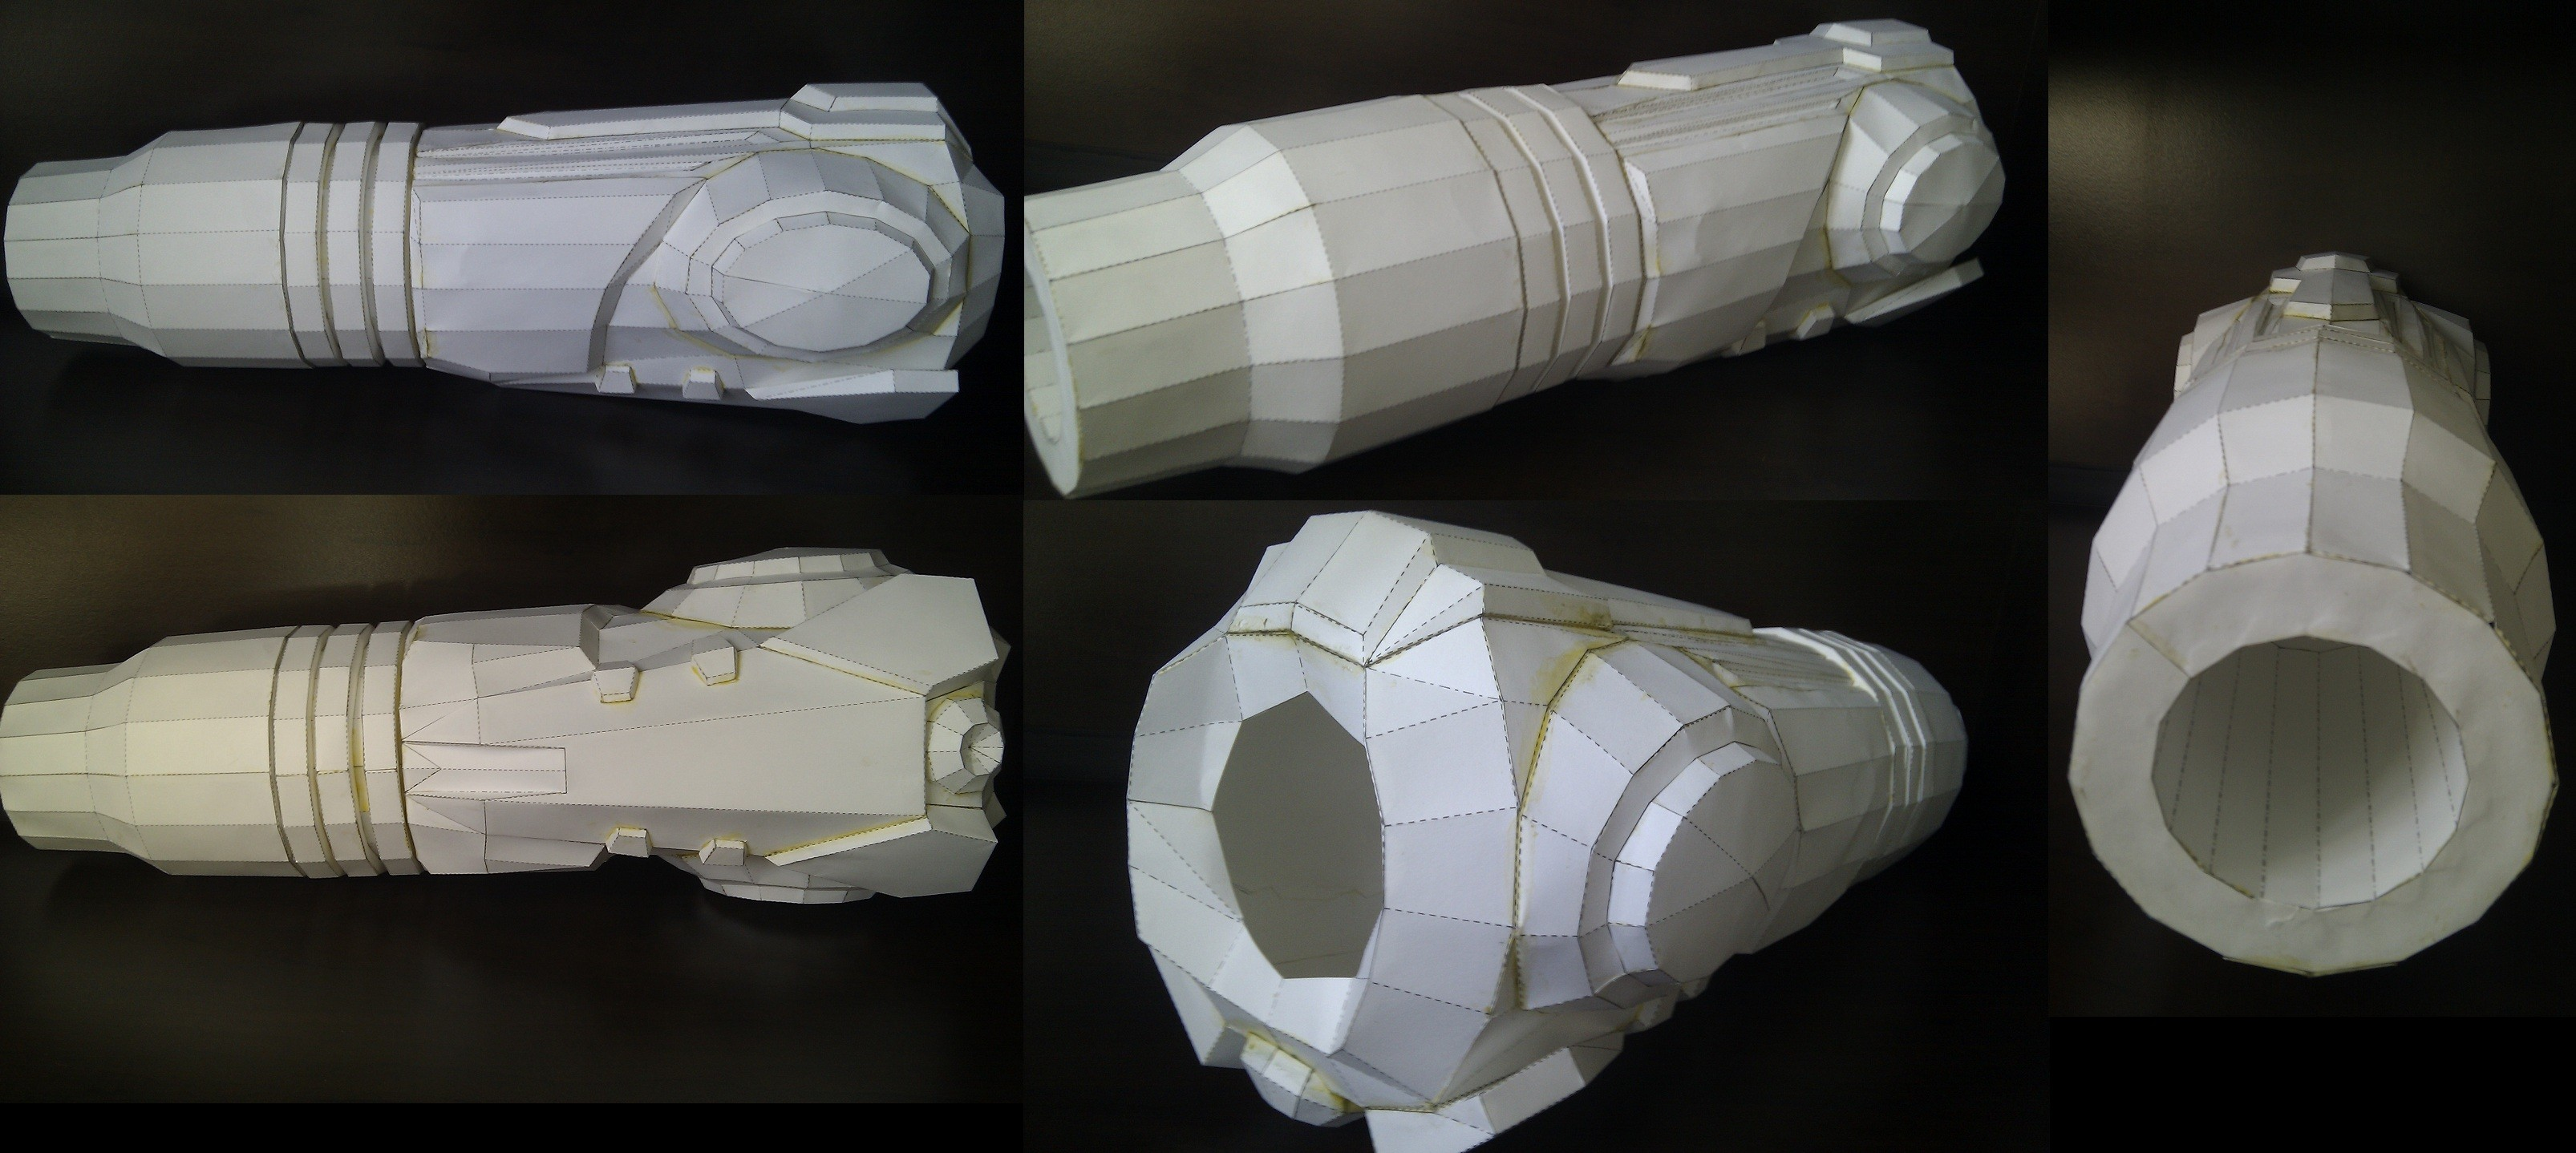 Cannon Papercraft Samus Arm Cannon Papercraft — Weasyl